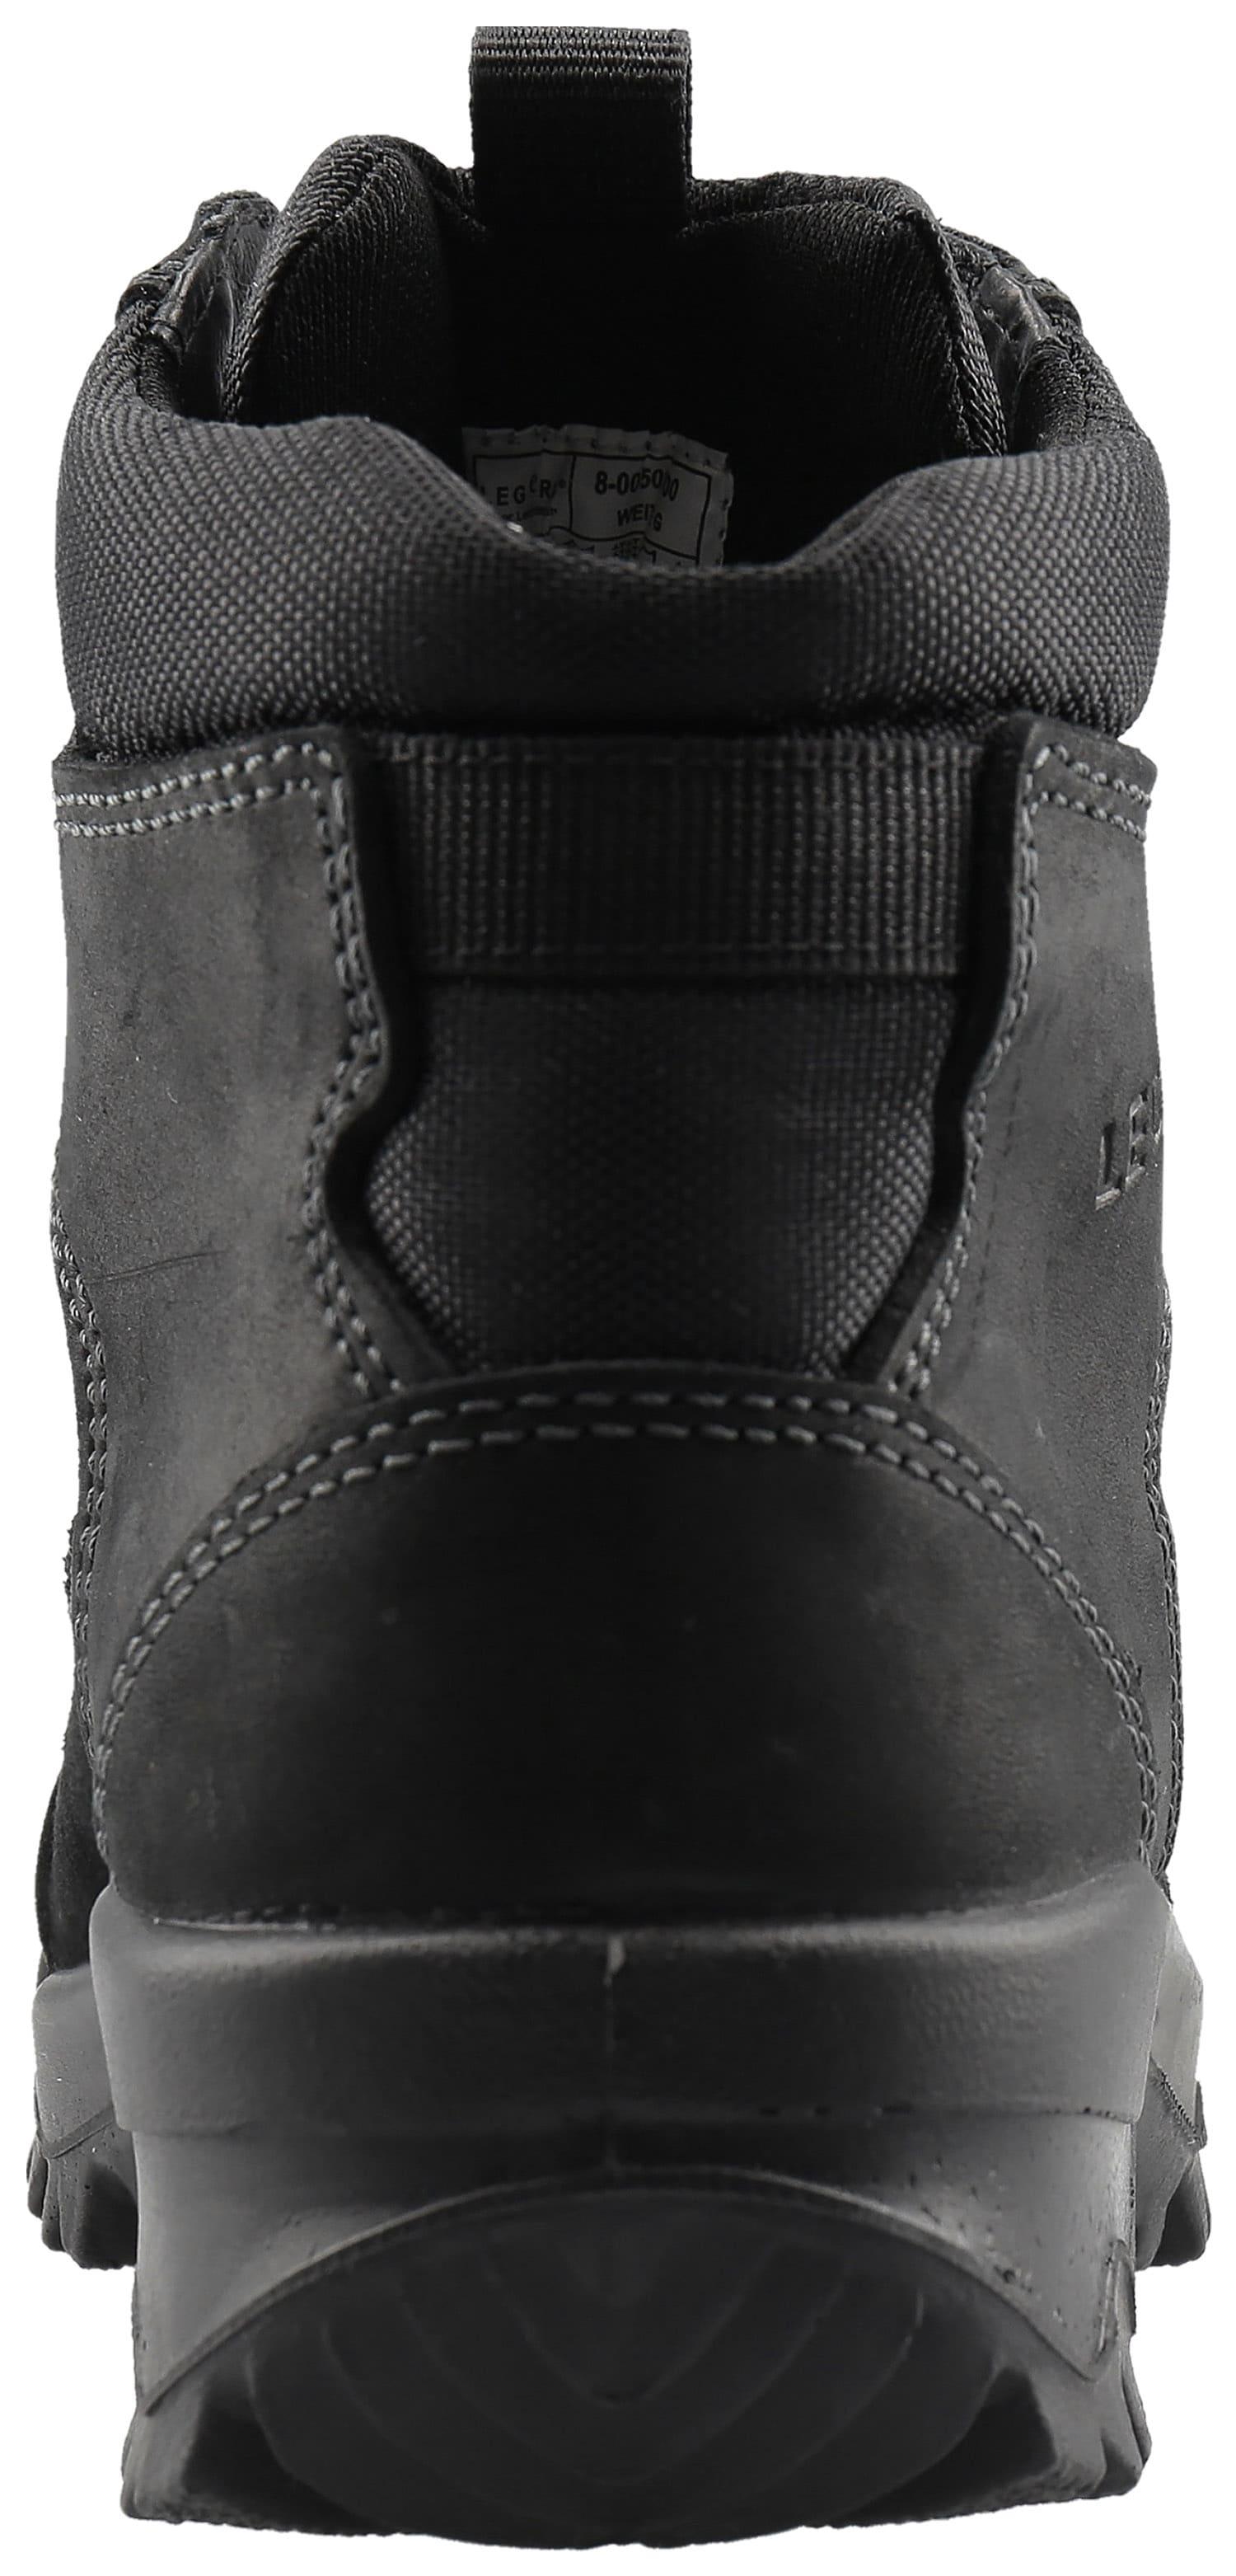 170377931bdeb Buty górskie damskie Gore-Tex® Legero Insulated Comfort